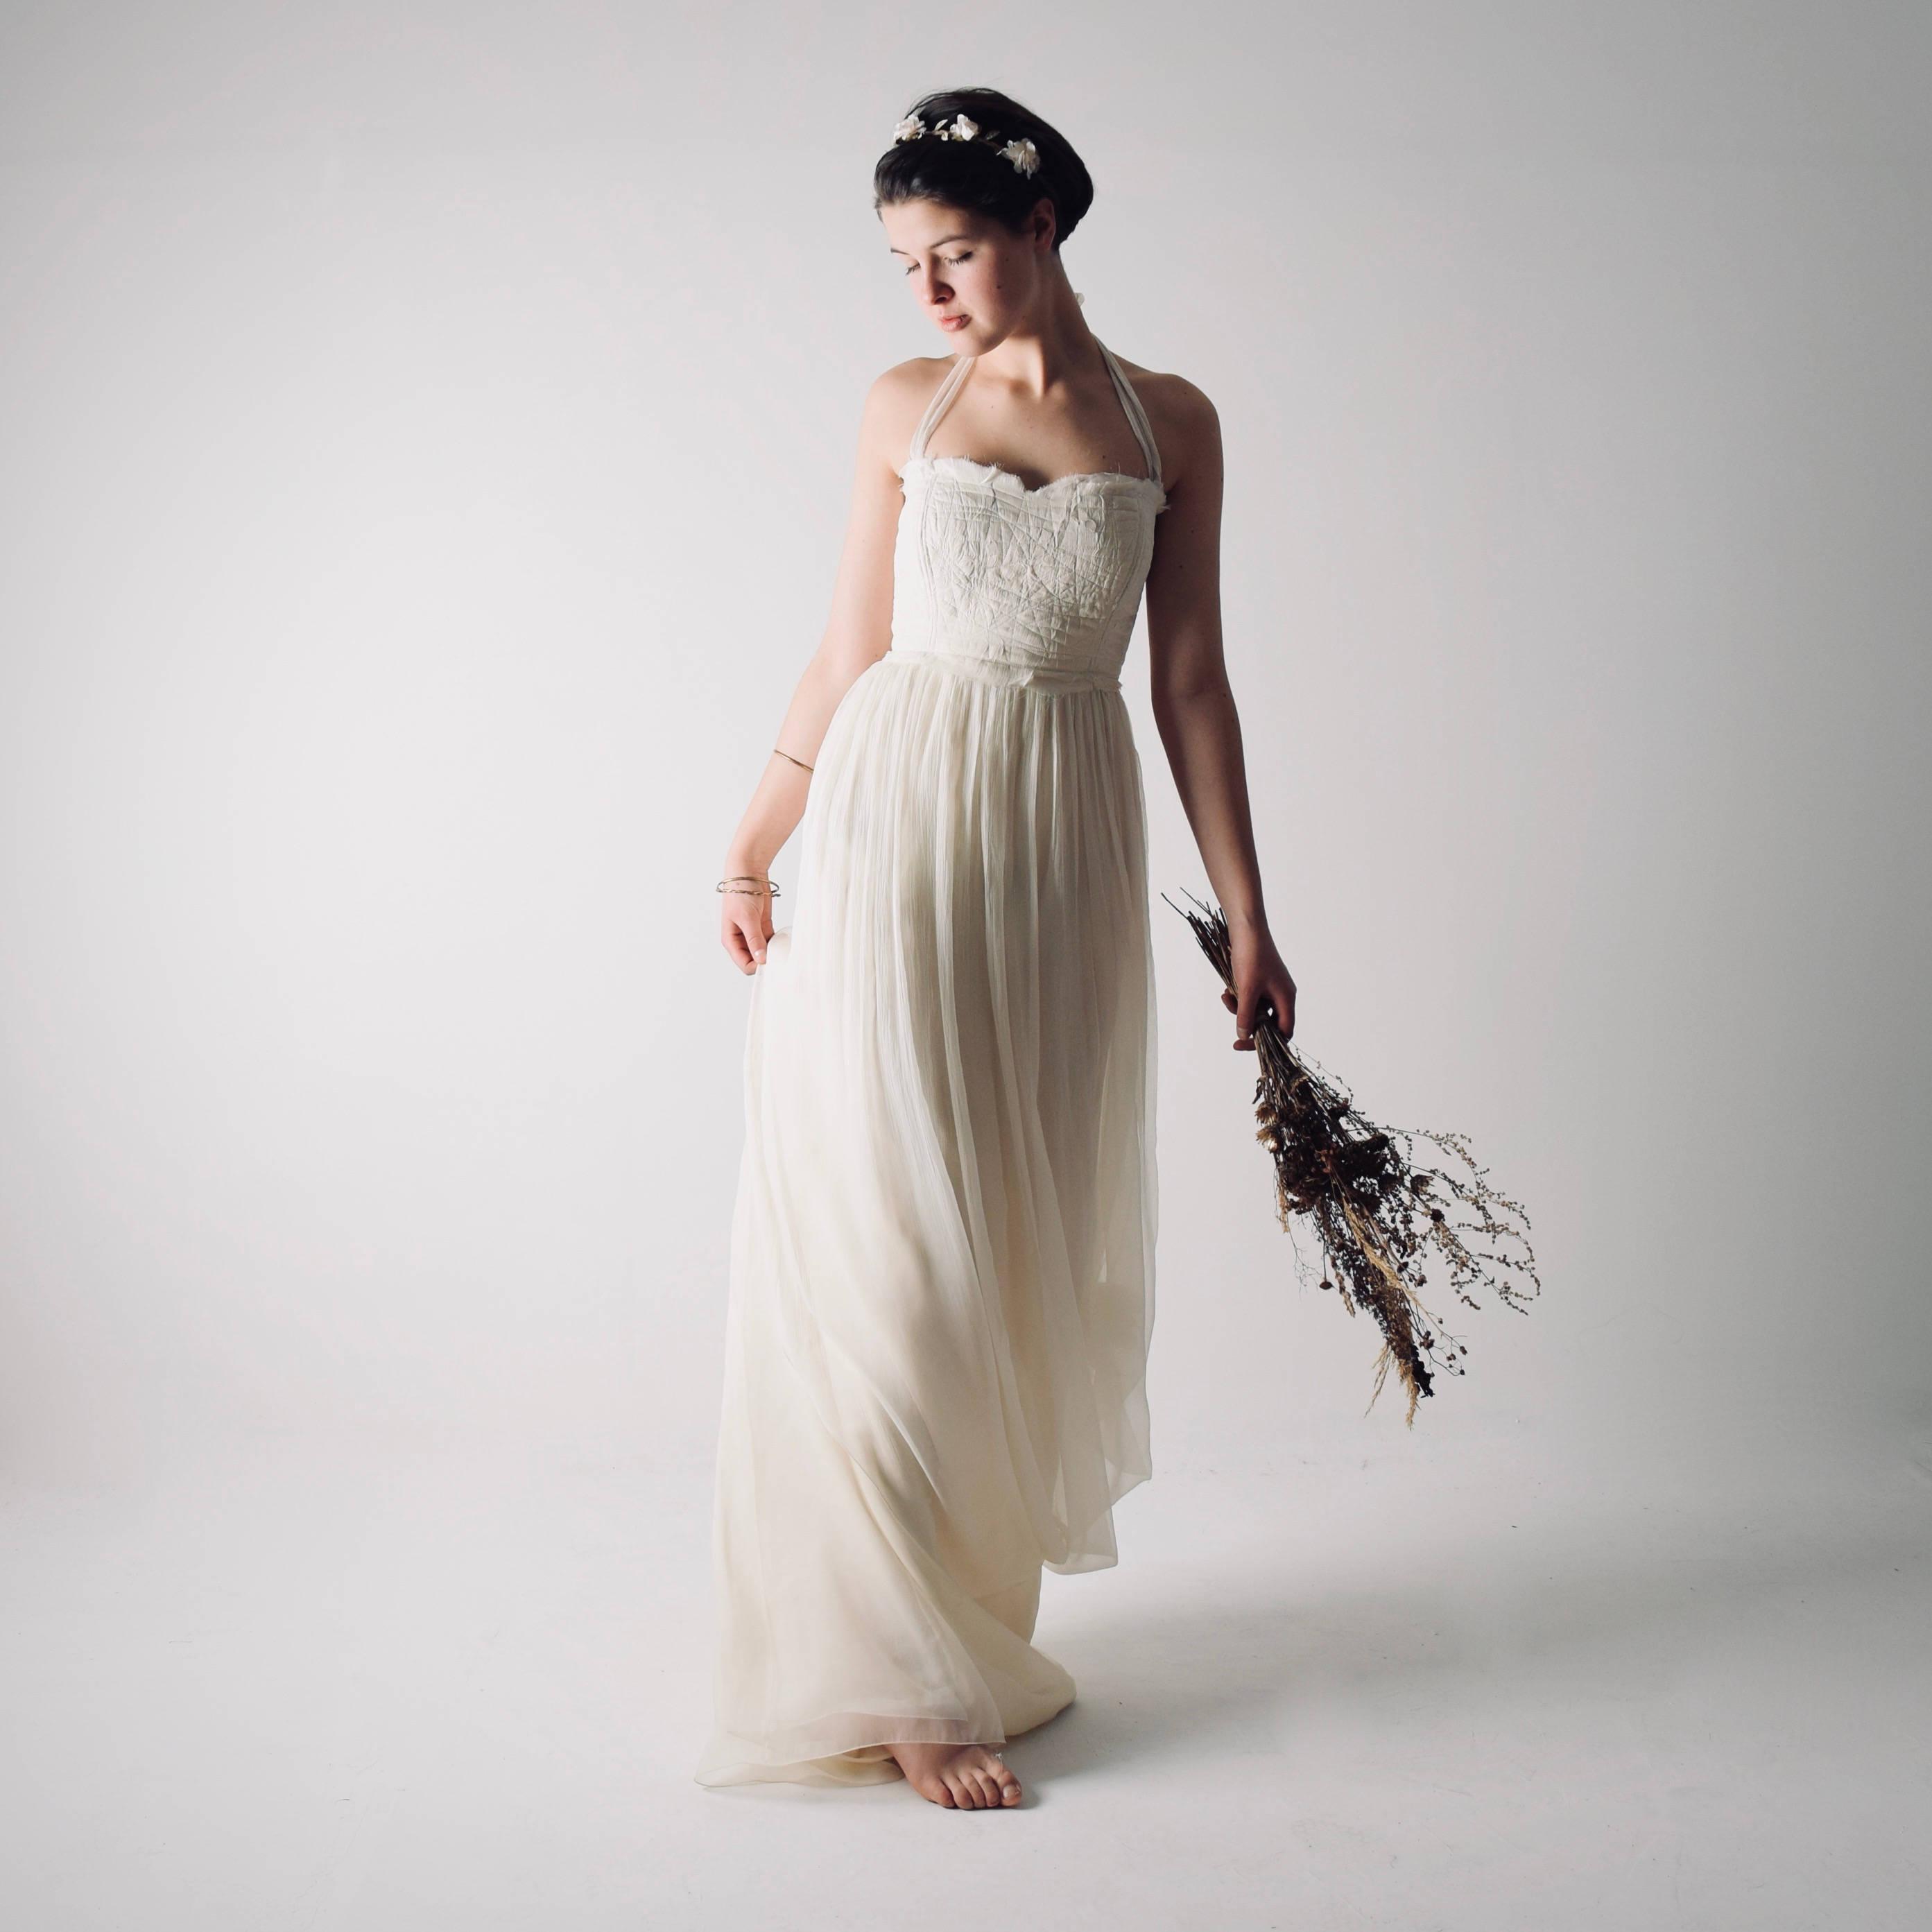 Boho beach wedding dress - Larimeloom